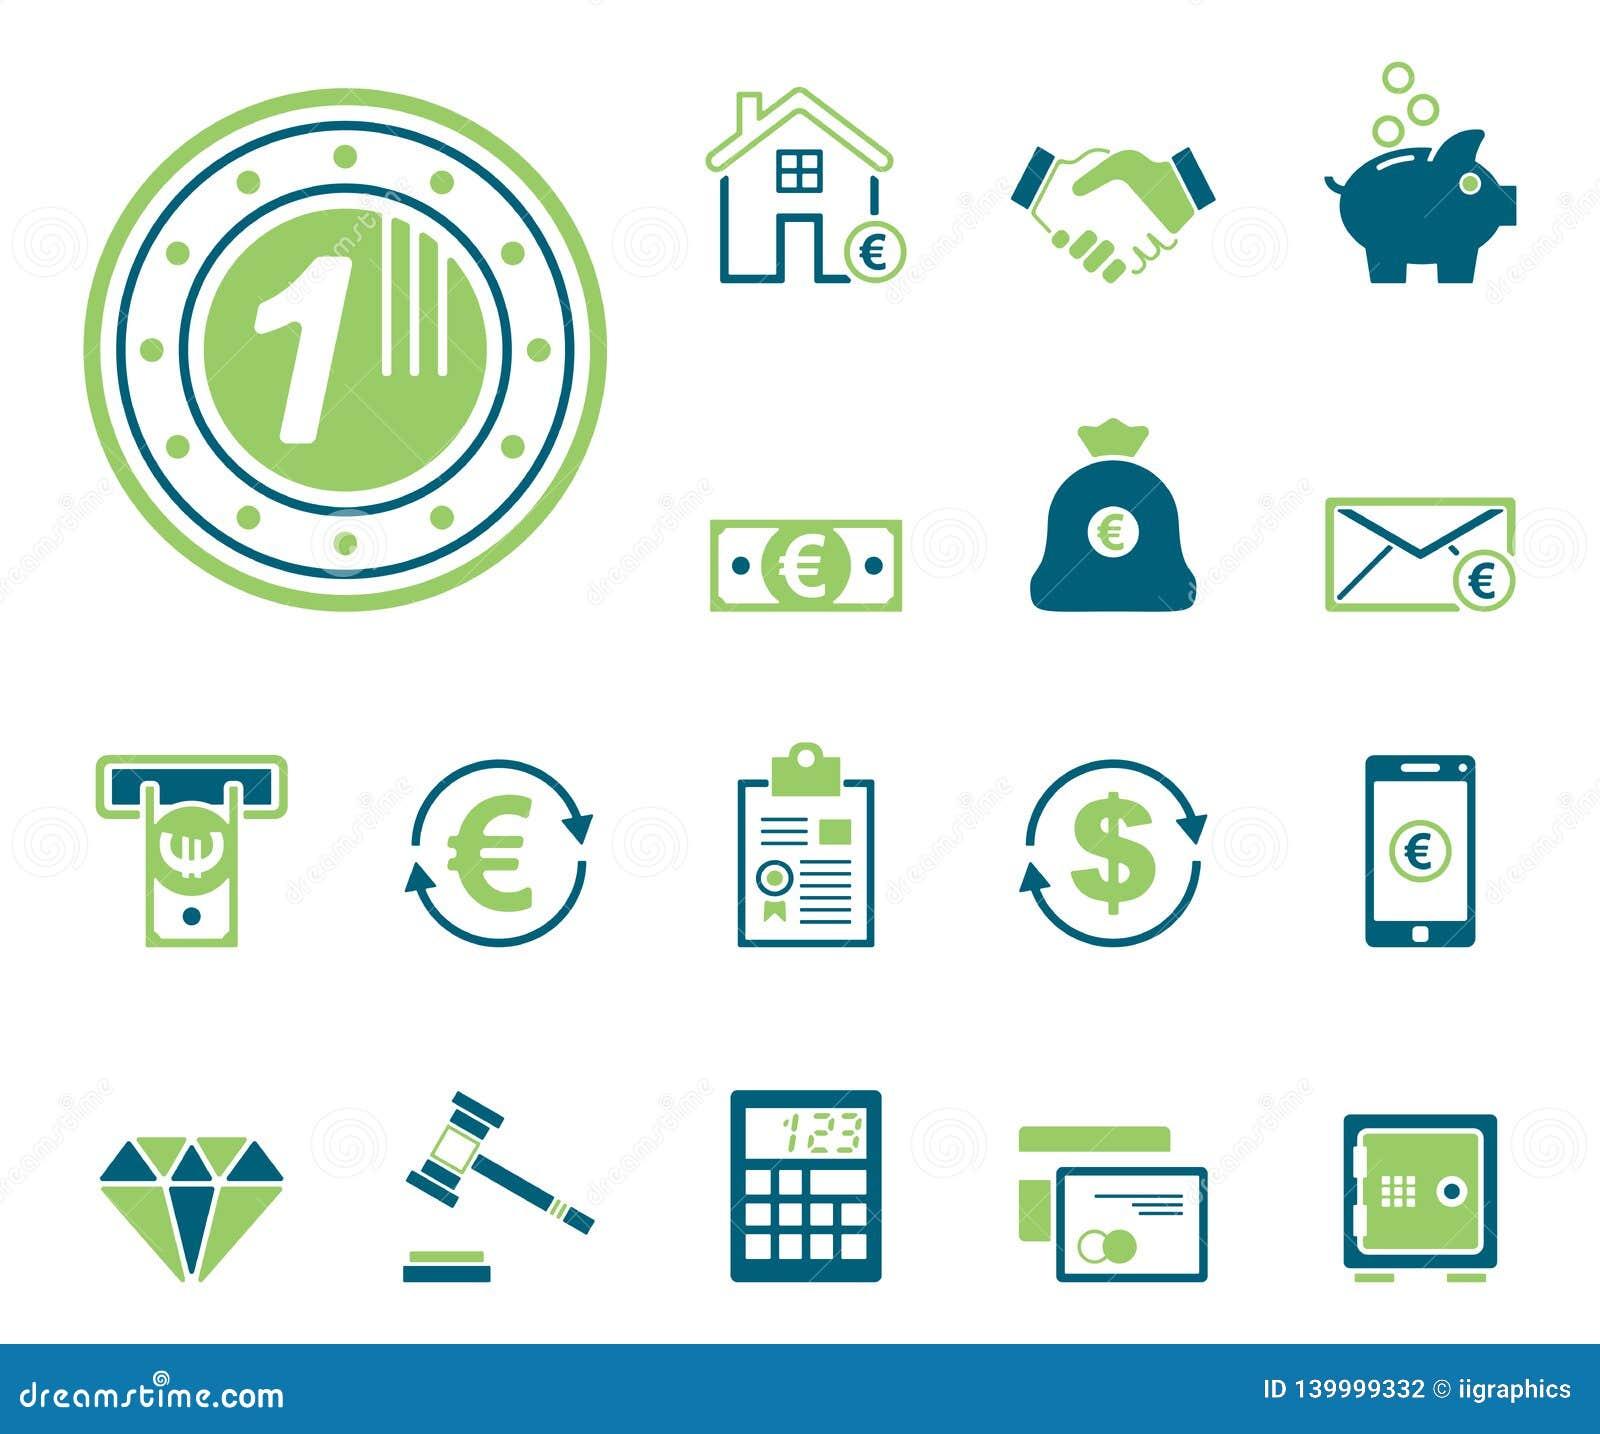 Financiën & Bank - Iconset - Pictogrammen